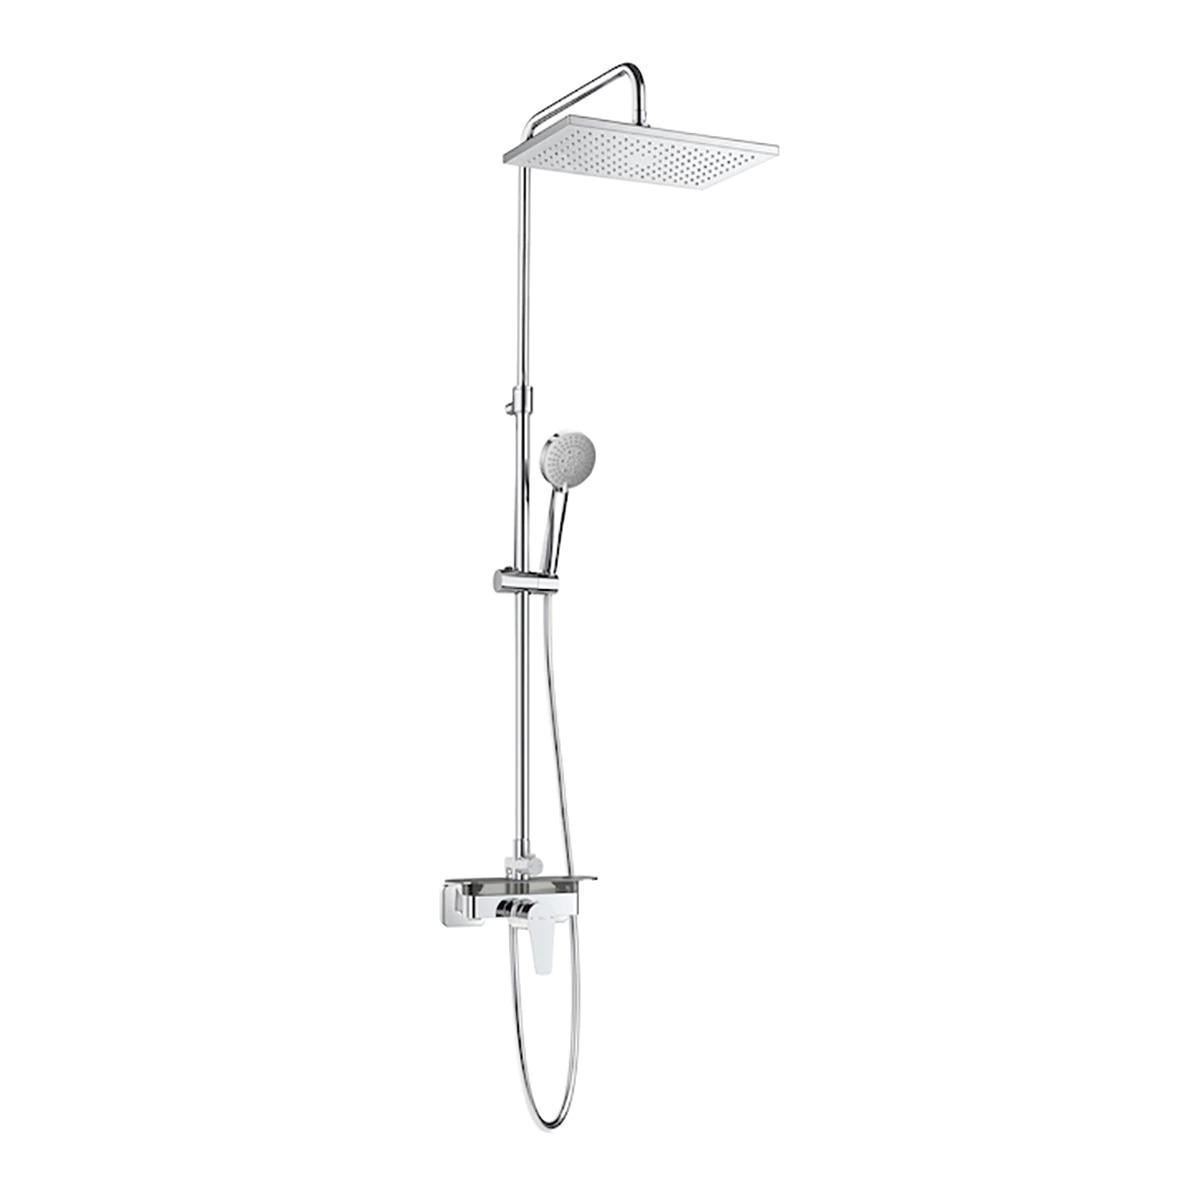 Even Roca shower set with mixer